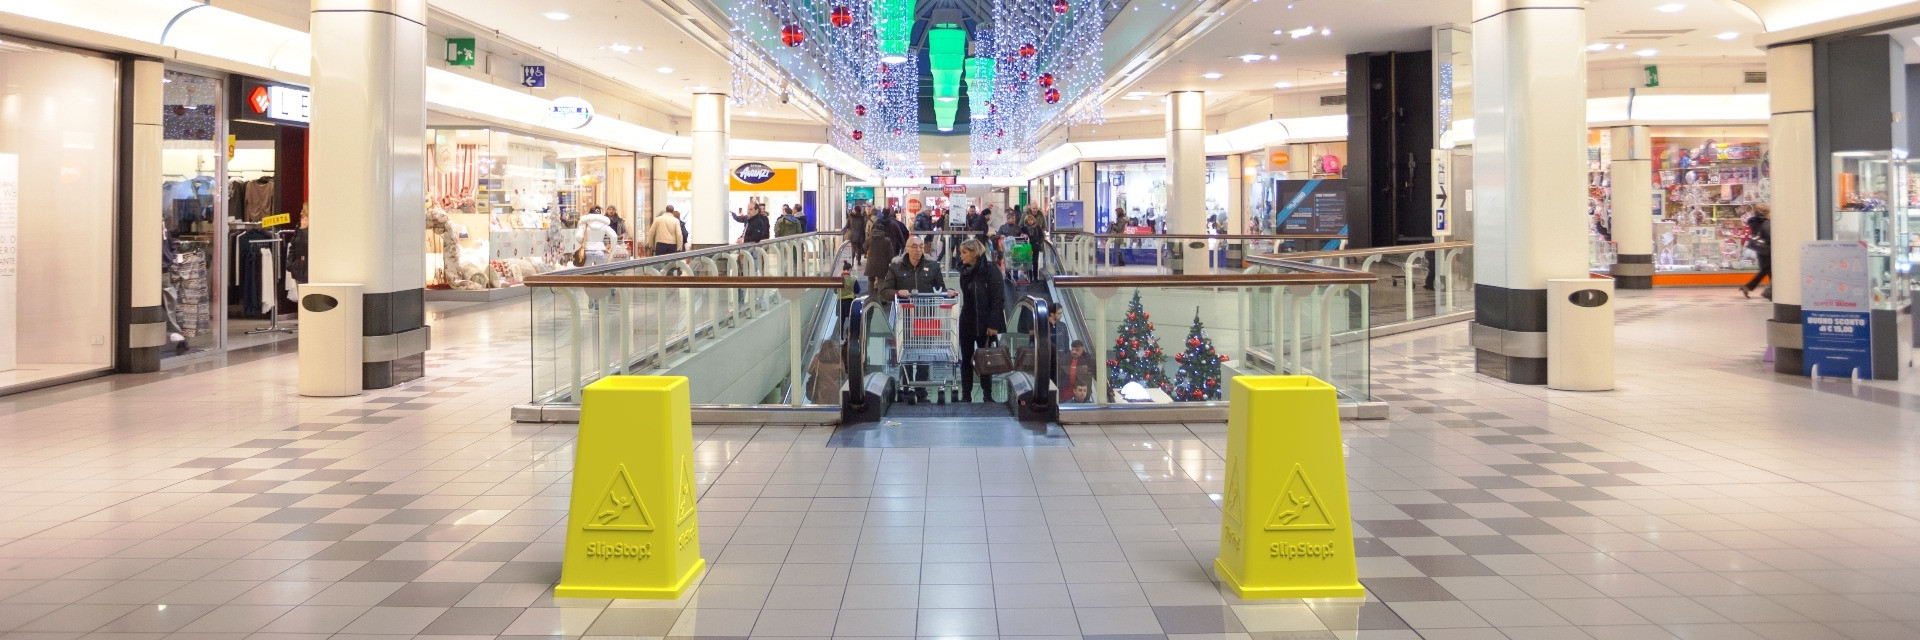 SlipStop Cone in Shopping Centre